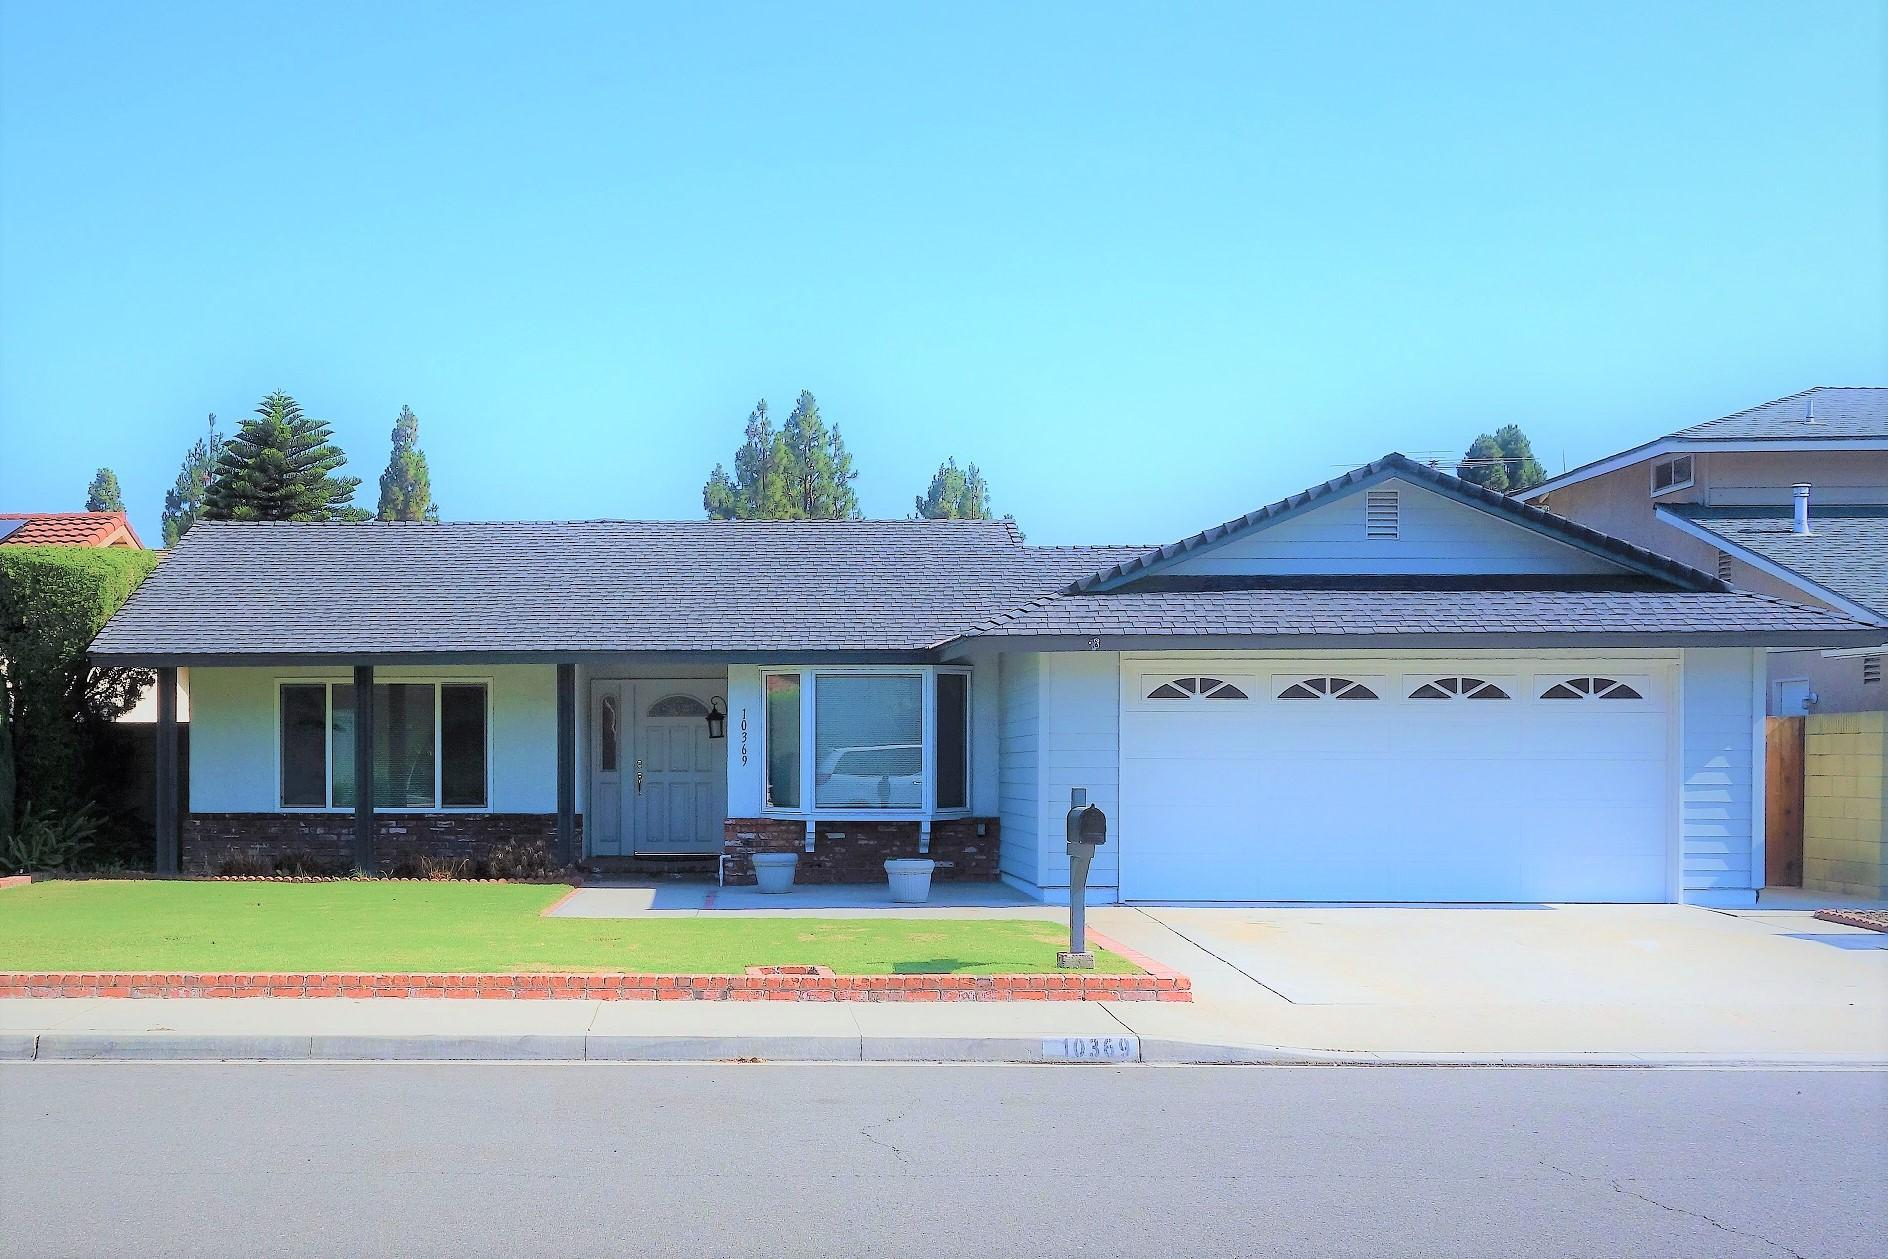 10369 Rainbow Cir, Fountain Valley, CA 92708 For Rent | Trulia